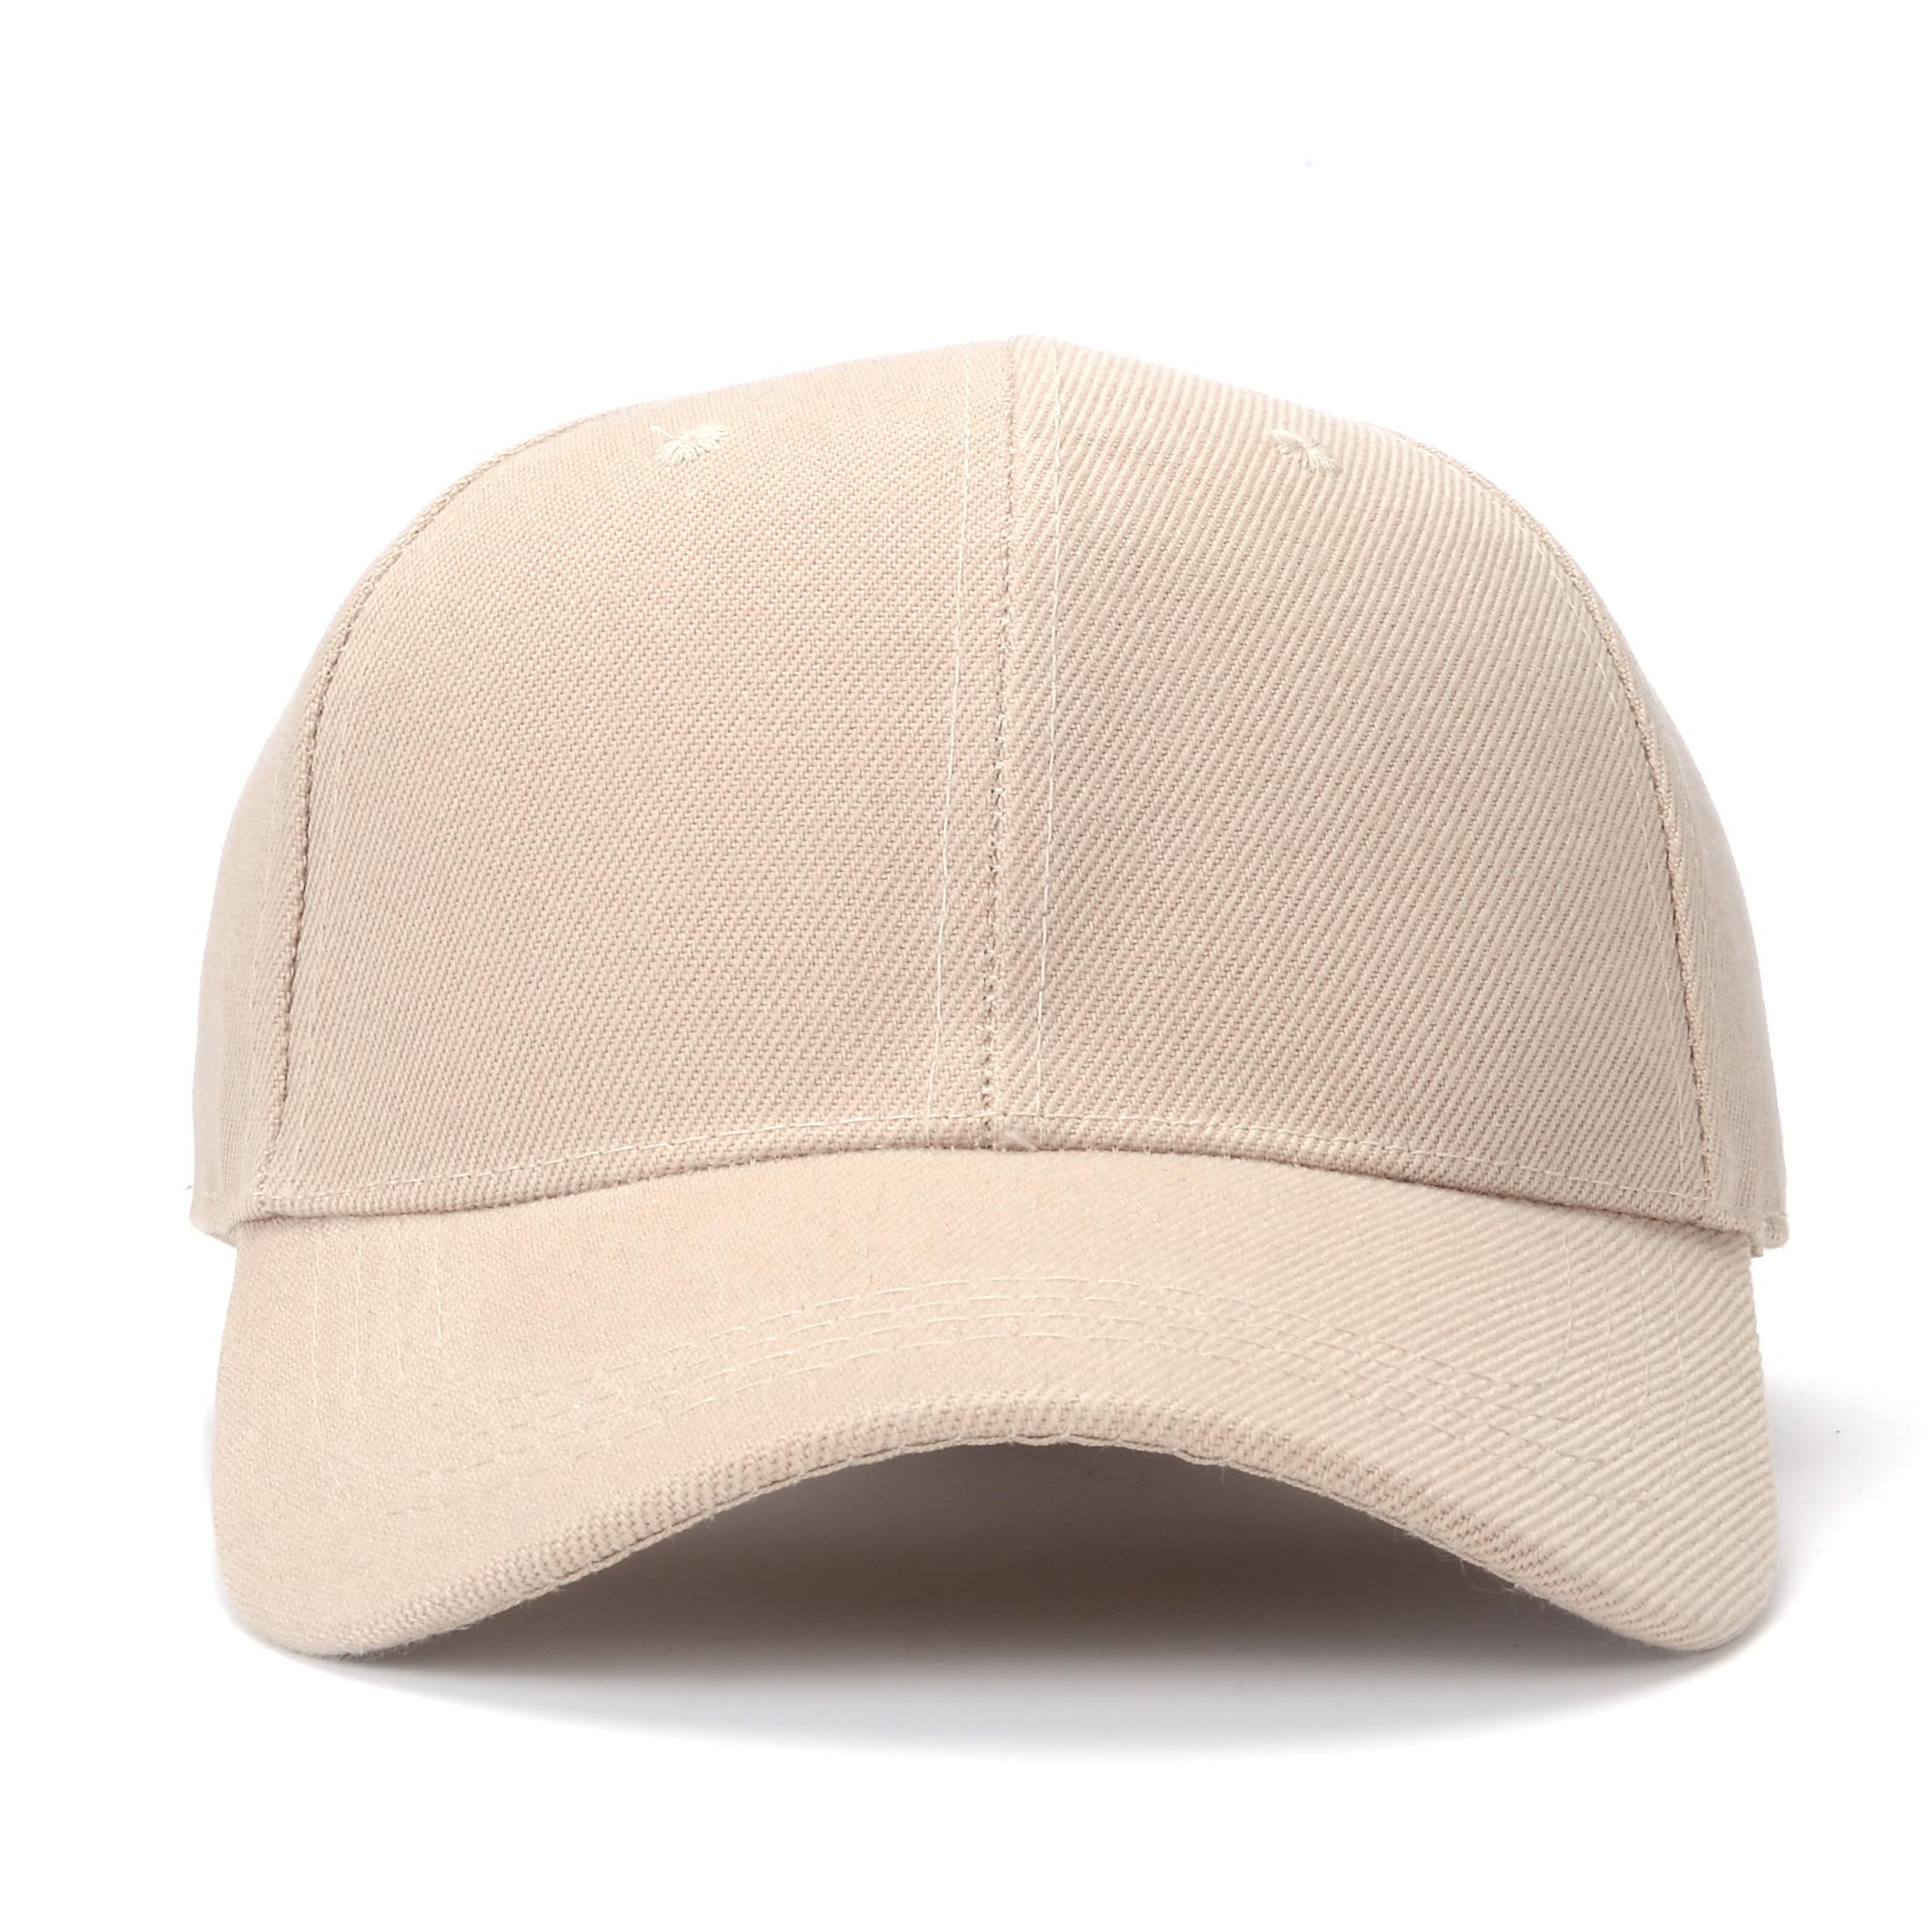 [SMOLDER]New Fashion Design Sports Fashion Plain Baseball Cap For Adult Men Women Dad Hat